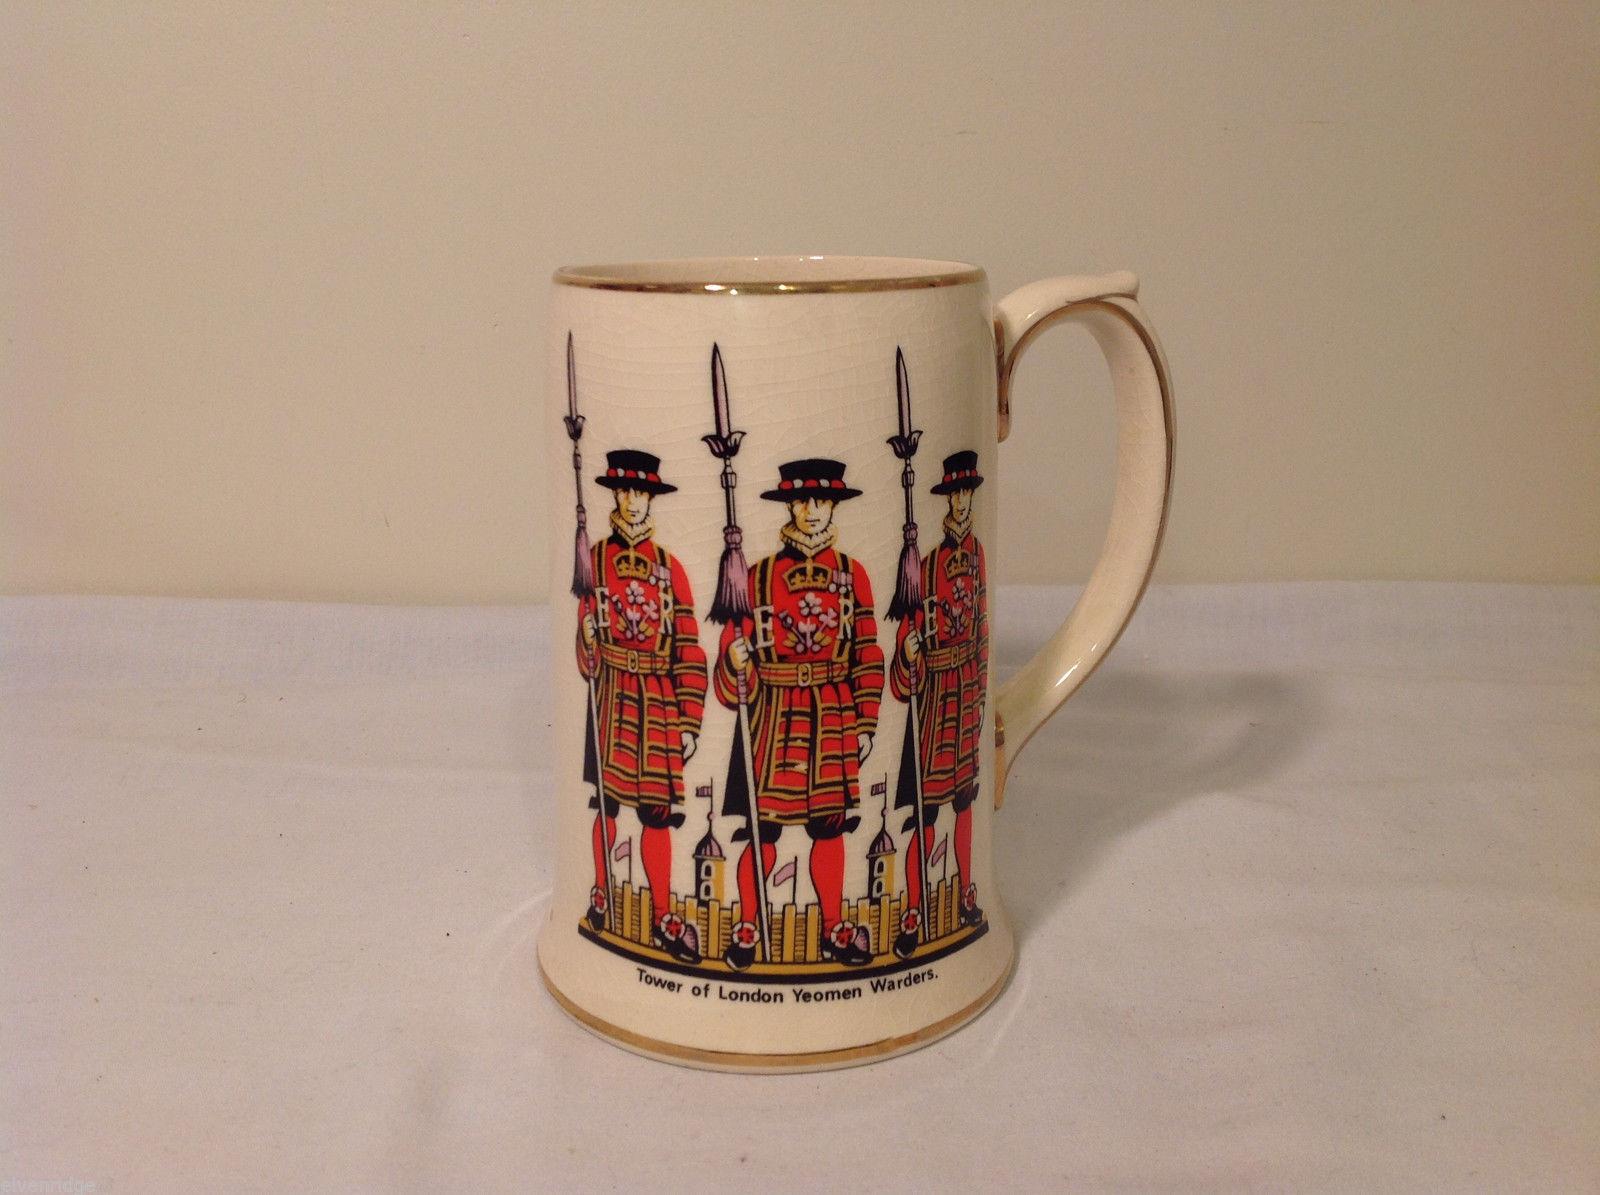 Vintage Sadler Tower of London Yeomen Warders Beer Mug Staffordshire England